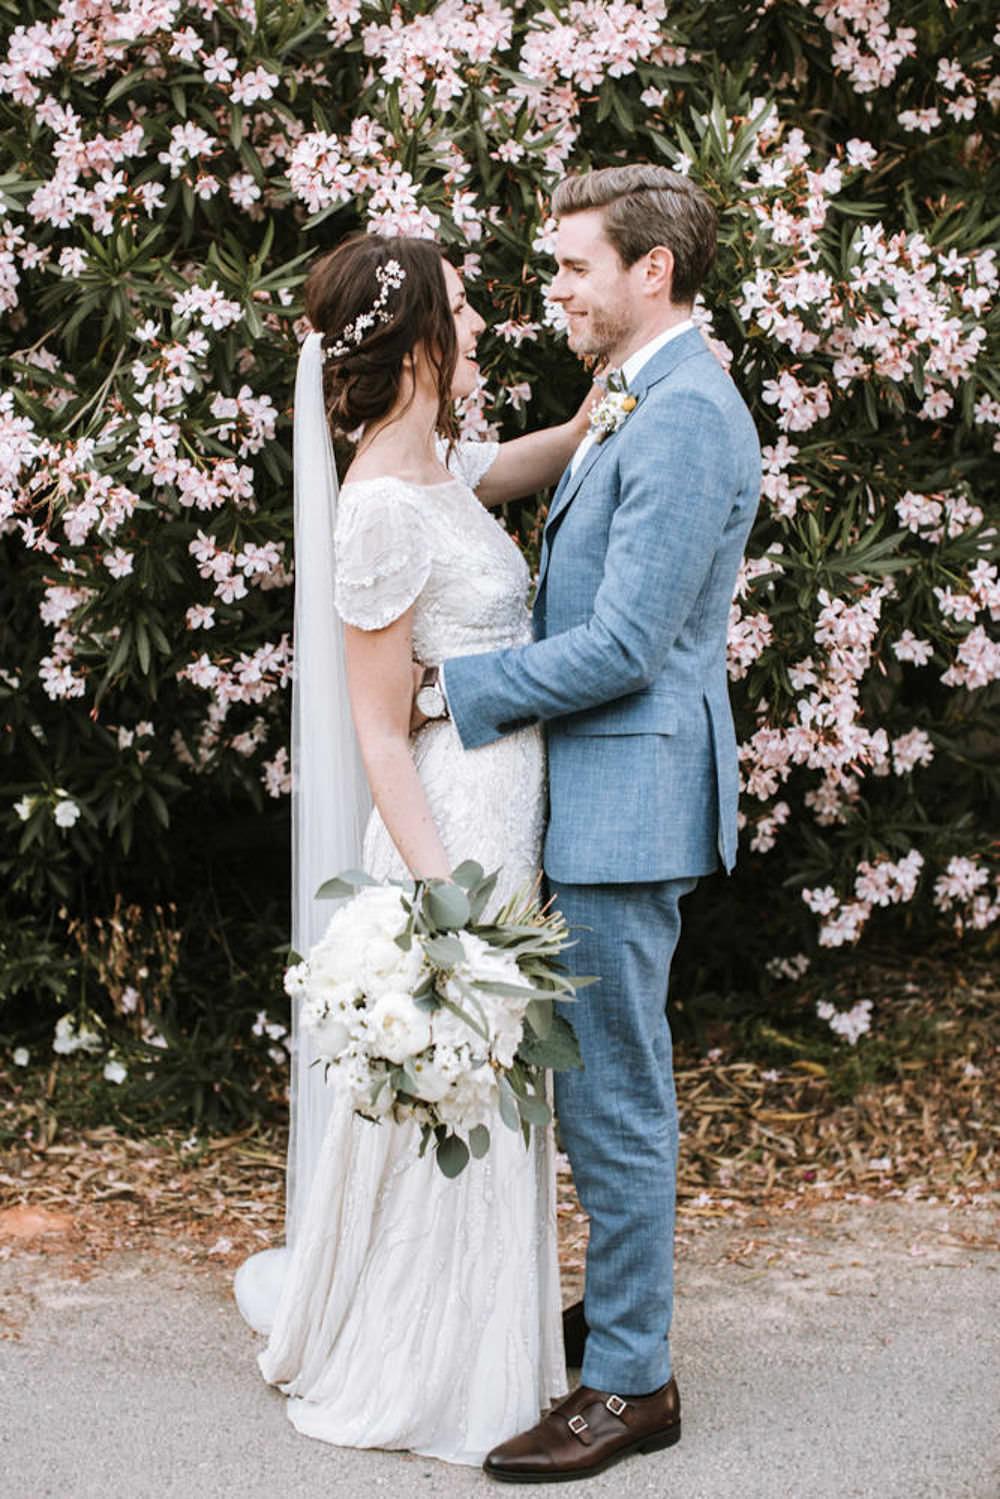 Bride Bridal Jenny Packham Beaded Short Sleeve Dress Gown Blue Suit Groom Hairpiece Vine Veil Portugal Destination Wedding Ana Parker Photography